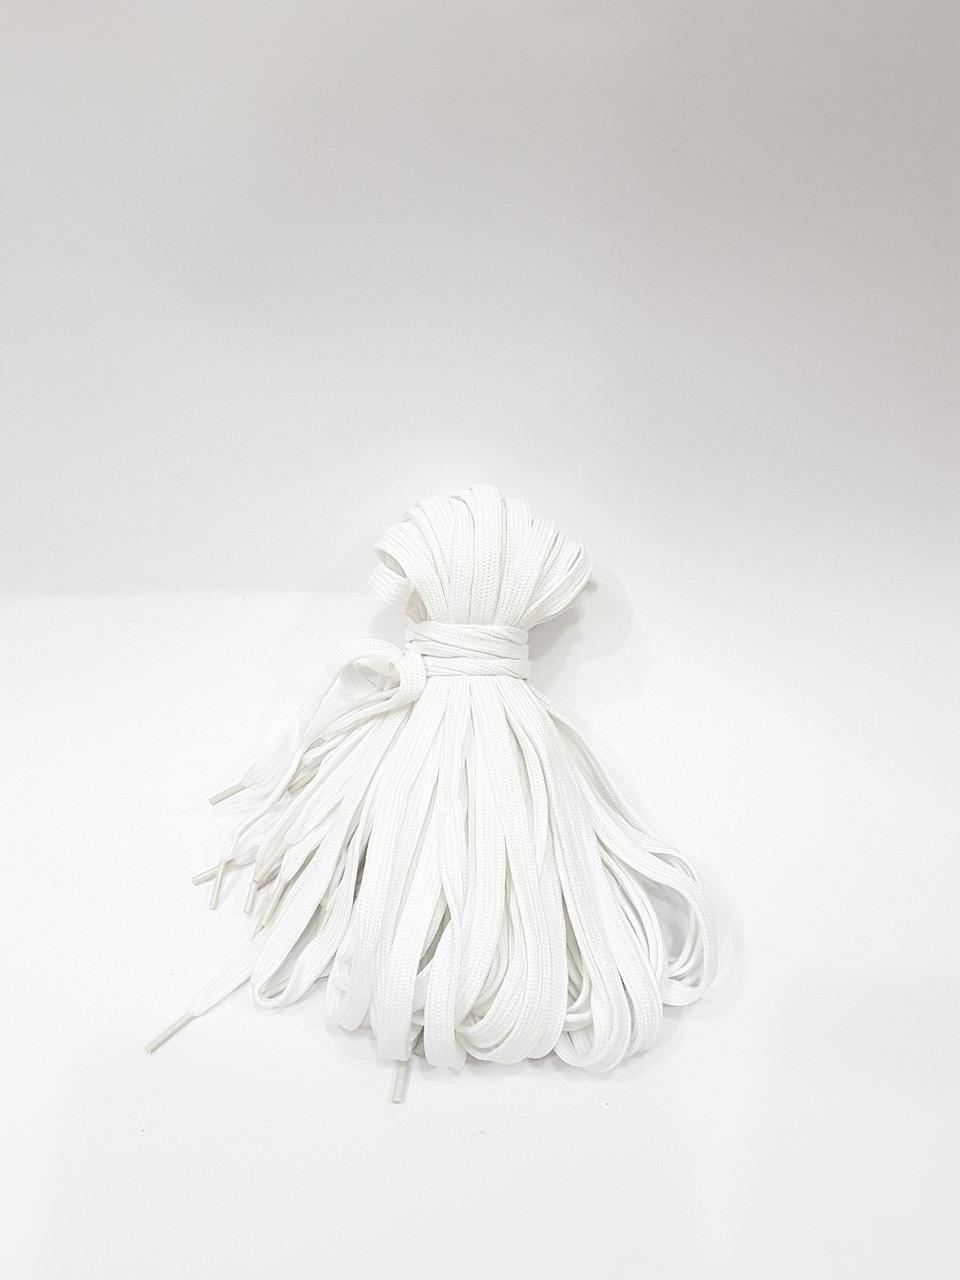 Шнурки для обуви плоские Белые 1 метр